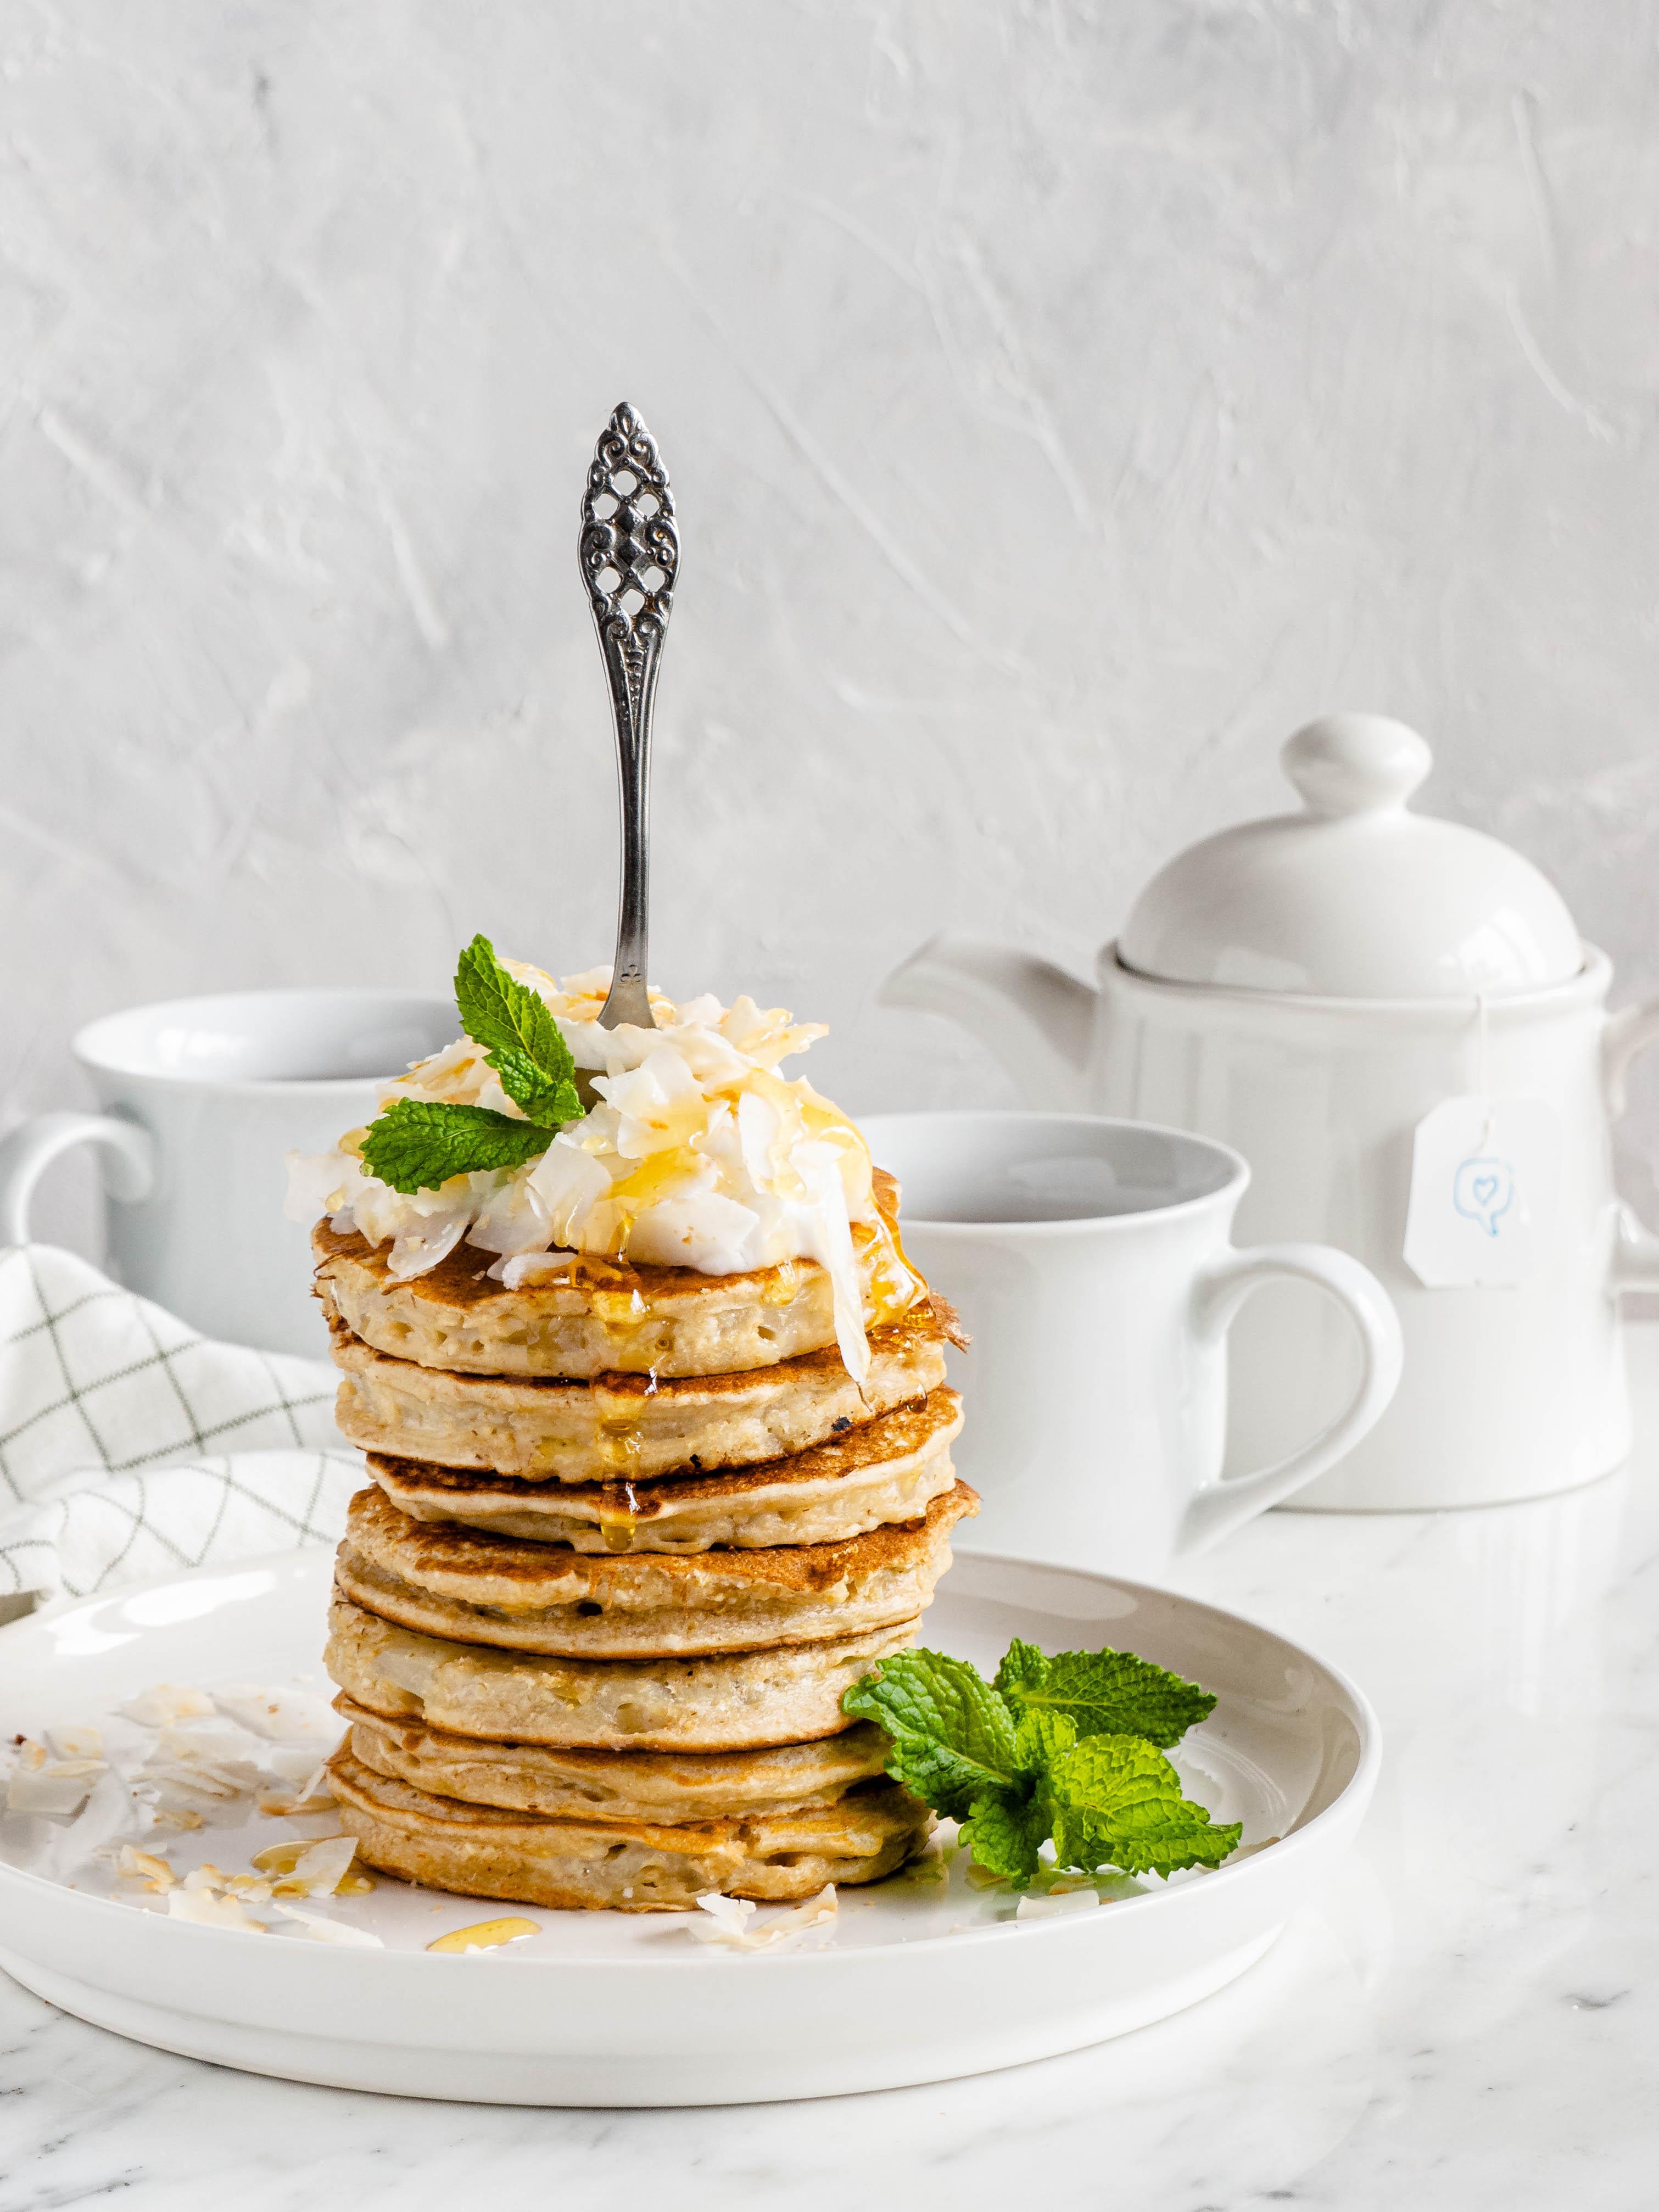 pancakes met ananasringen